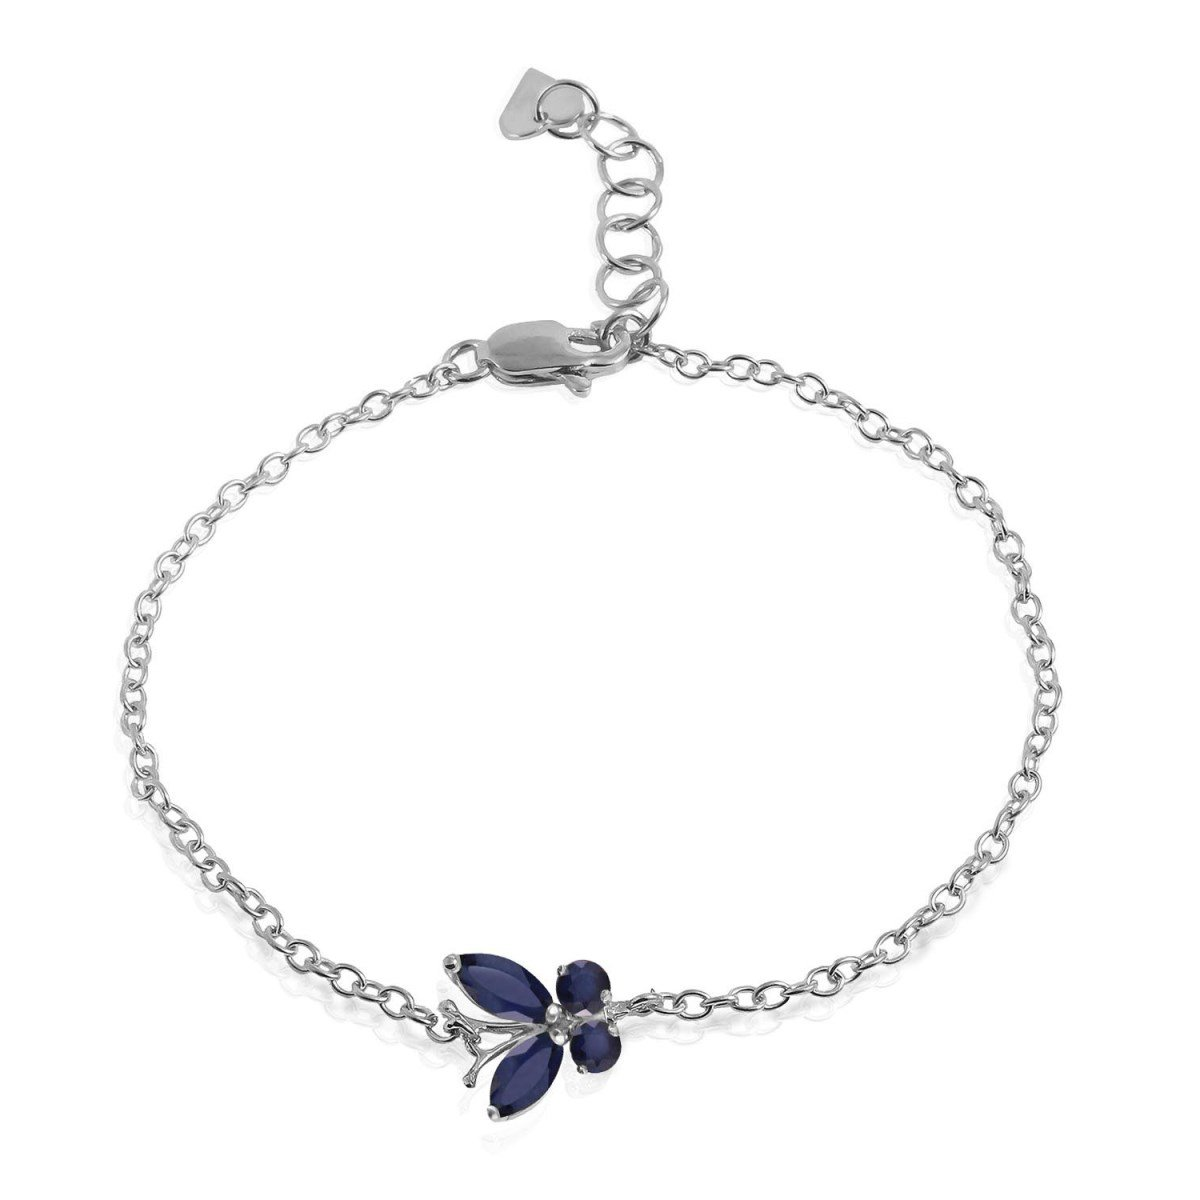 14K Solid White Gold Wings of a Butterfly Bracelet Sapphire 5030-W